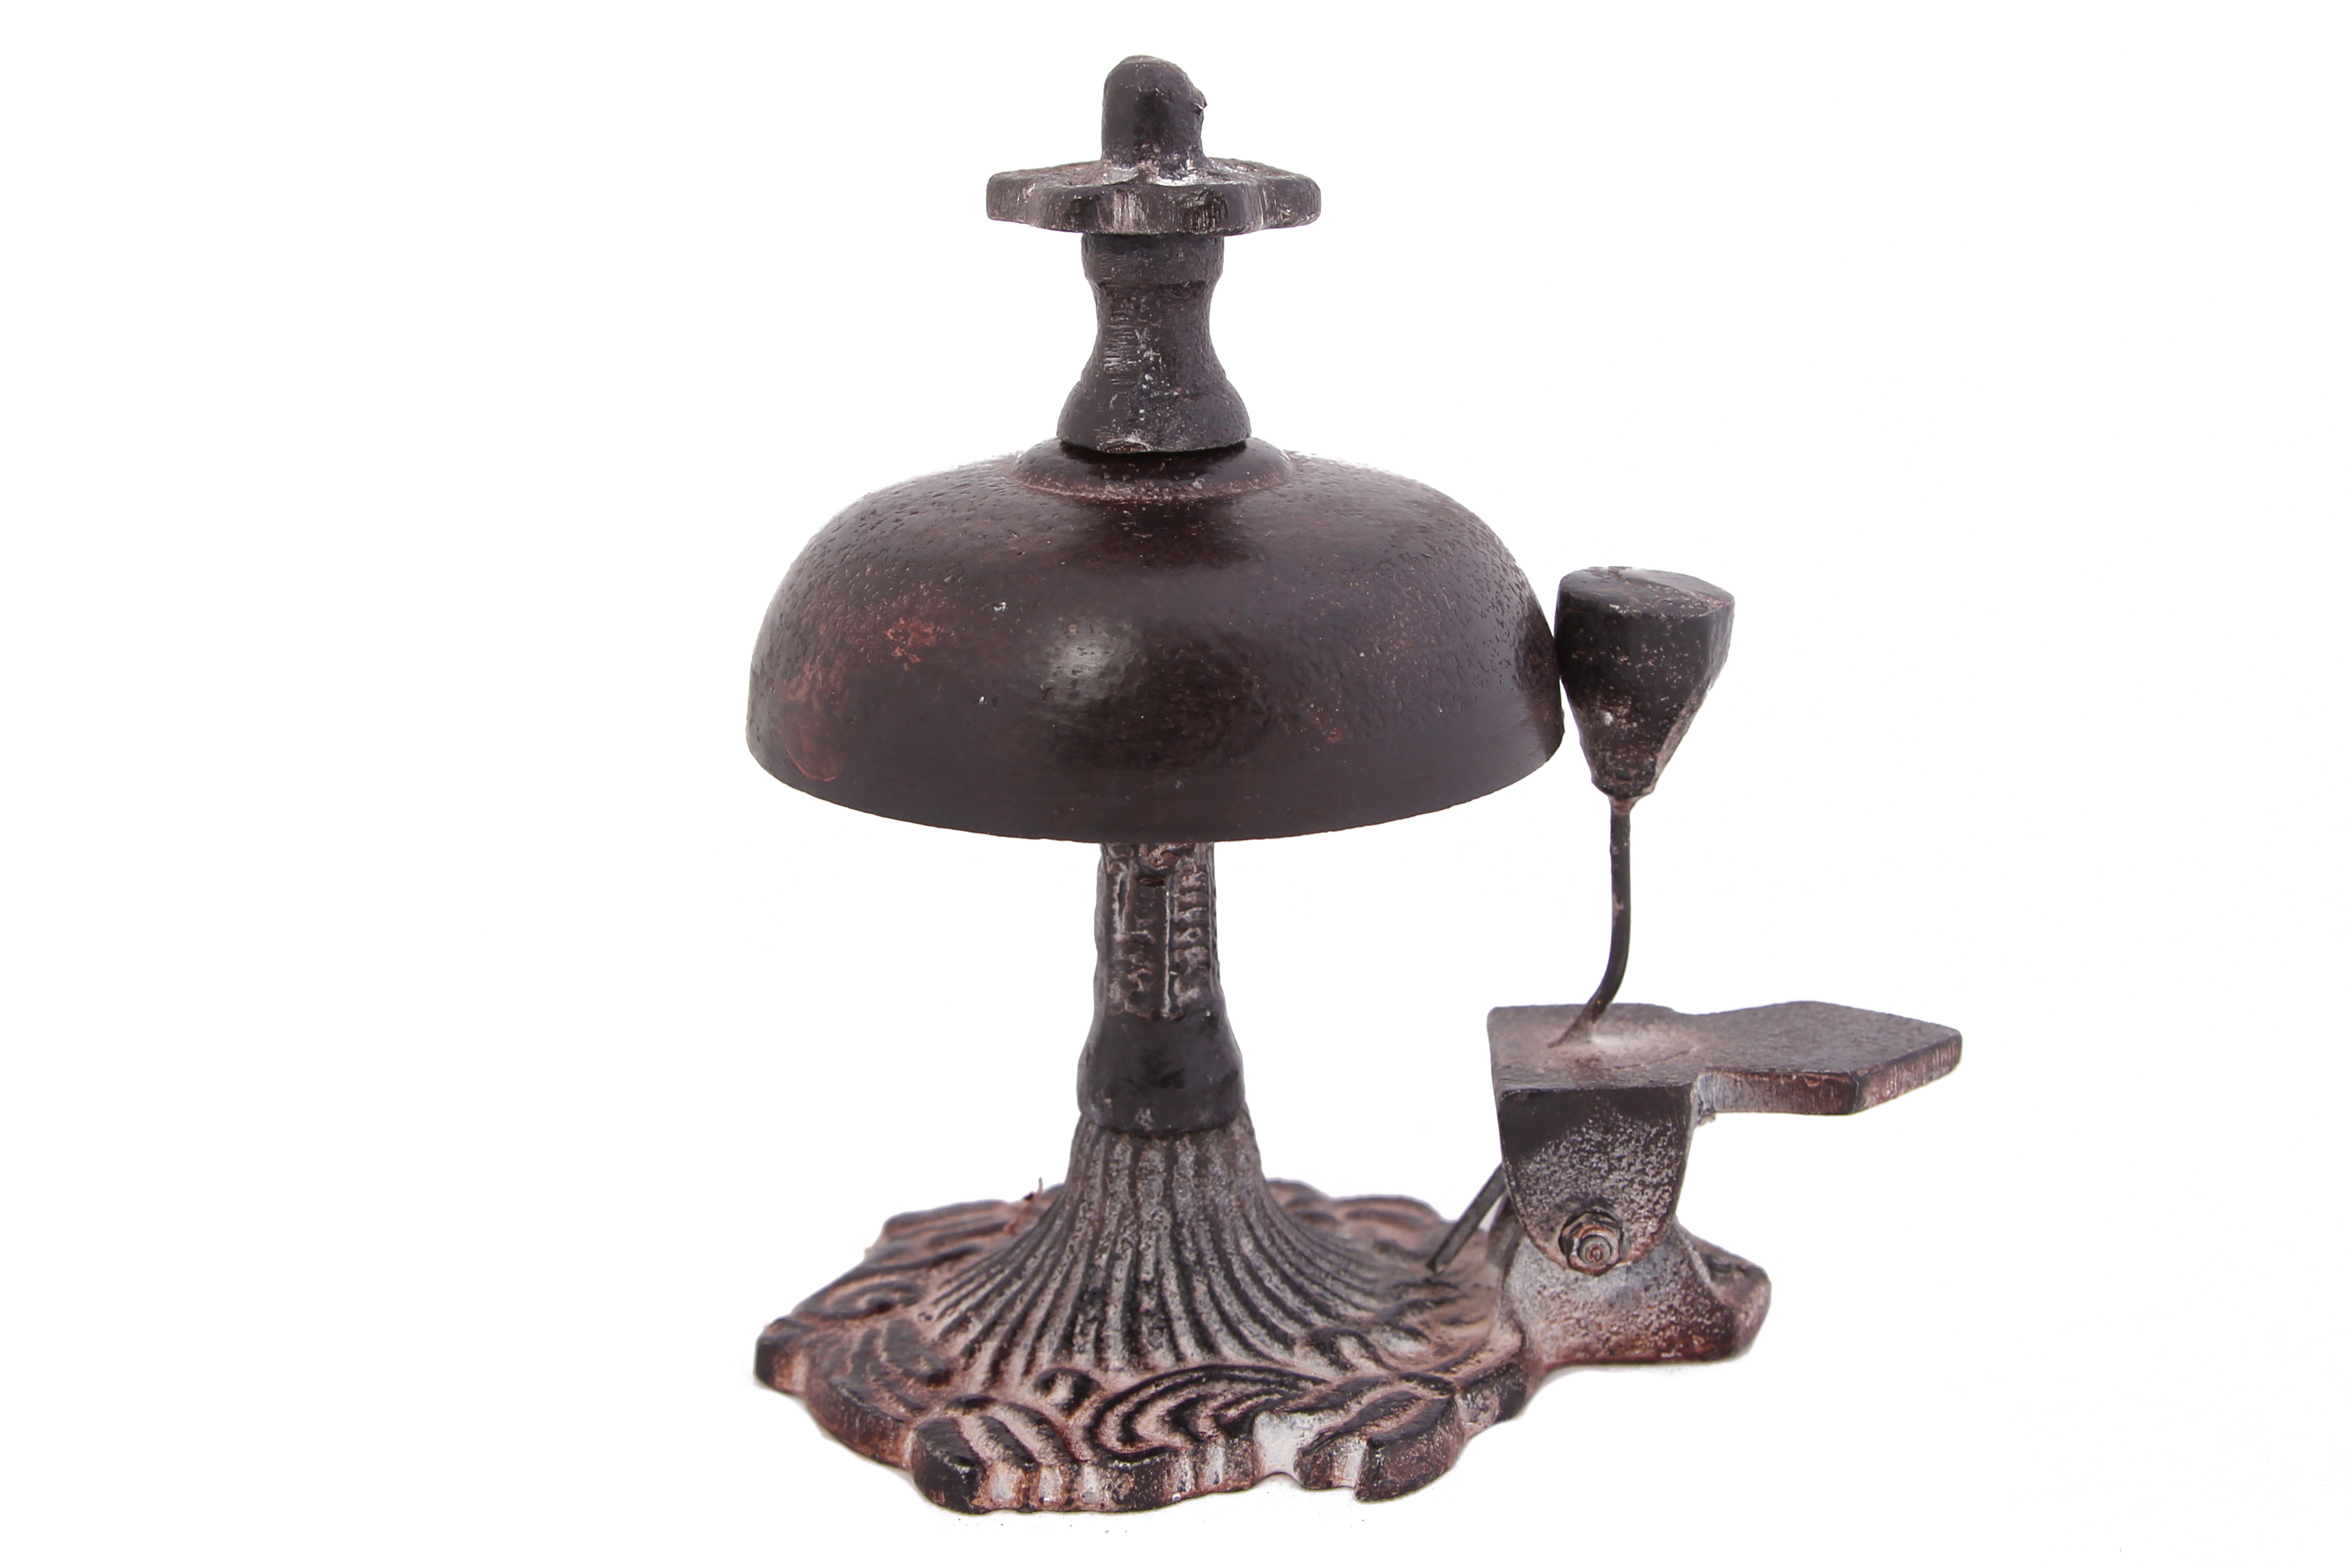 Статуэтки и фигурки Ганг Колокольчик Napoli (8х13 см) ганг колокольчик fidelity 15х22 см